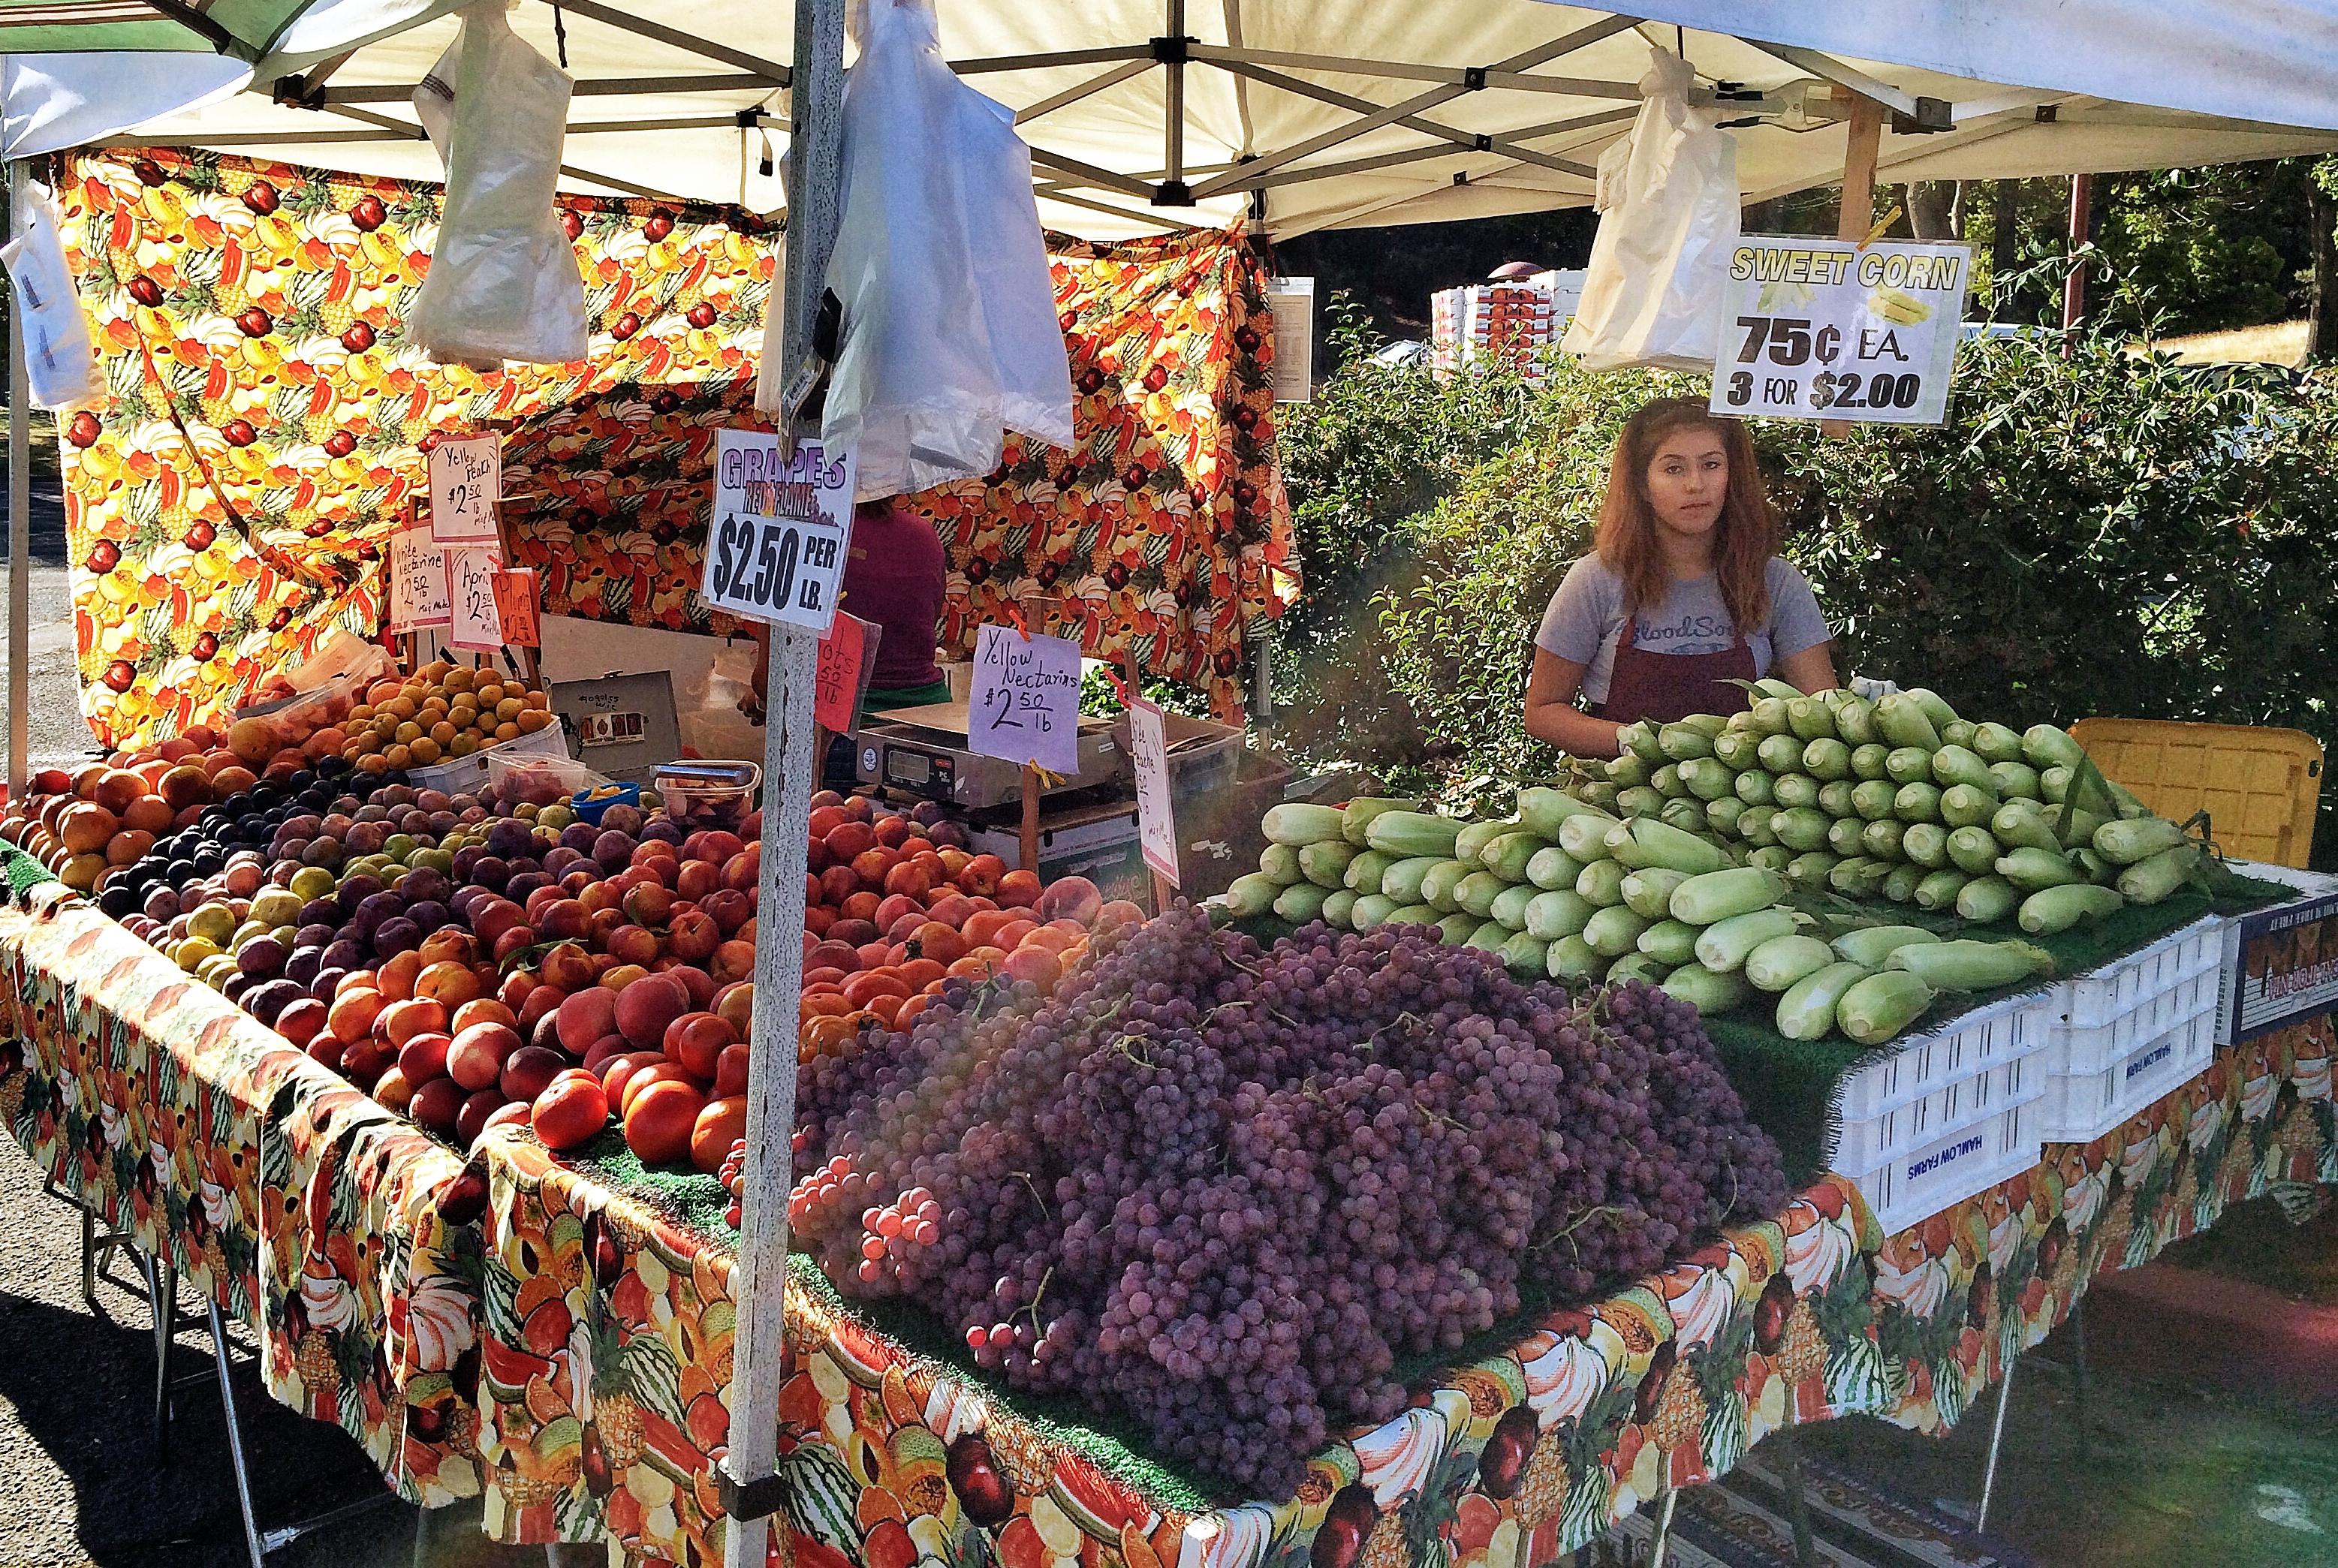 stone fruit, grapes & sweet corn